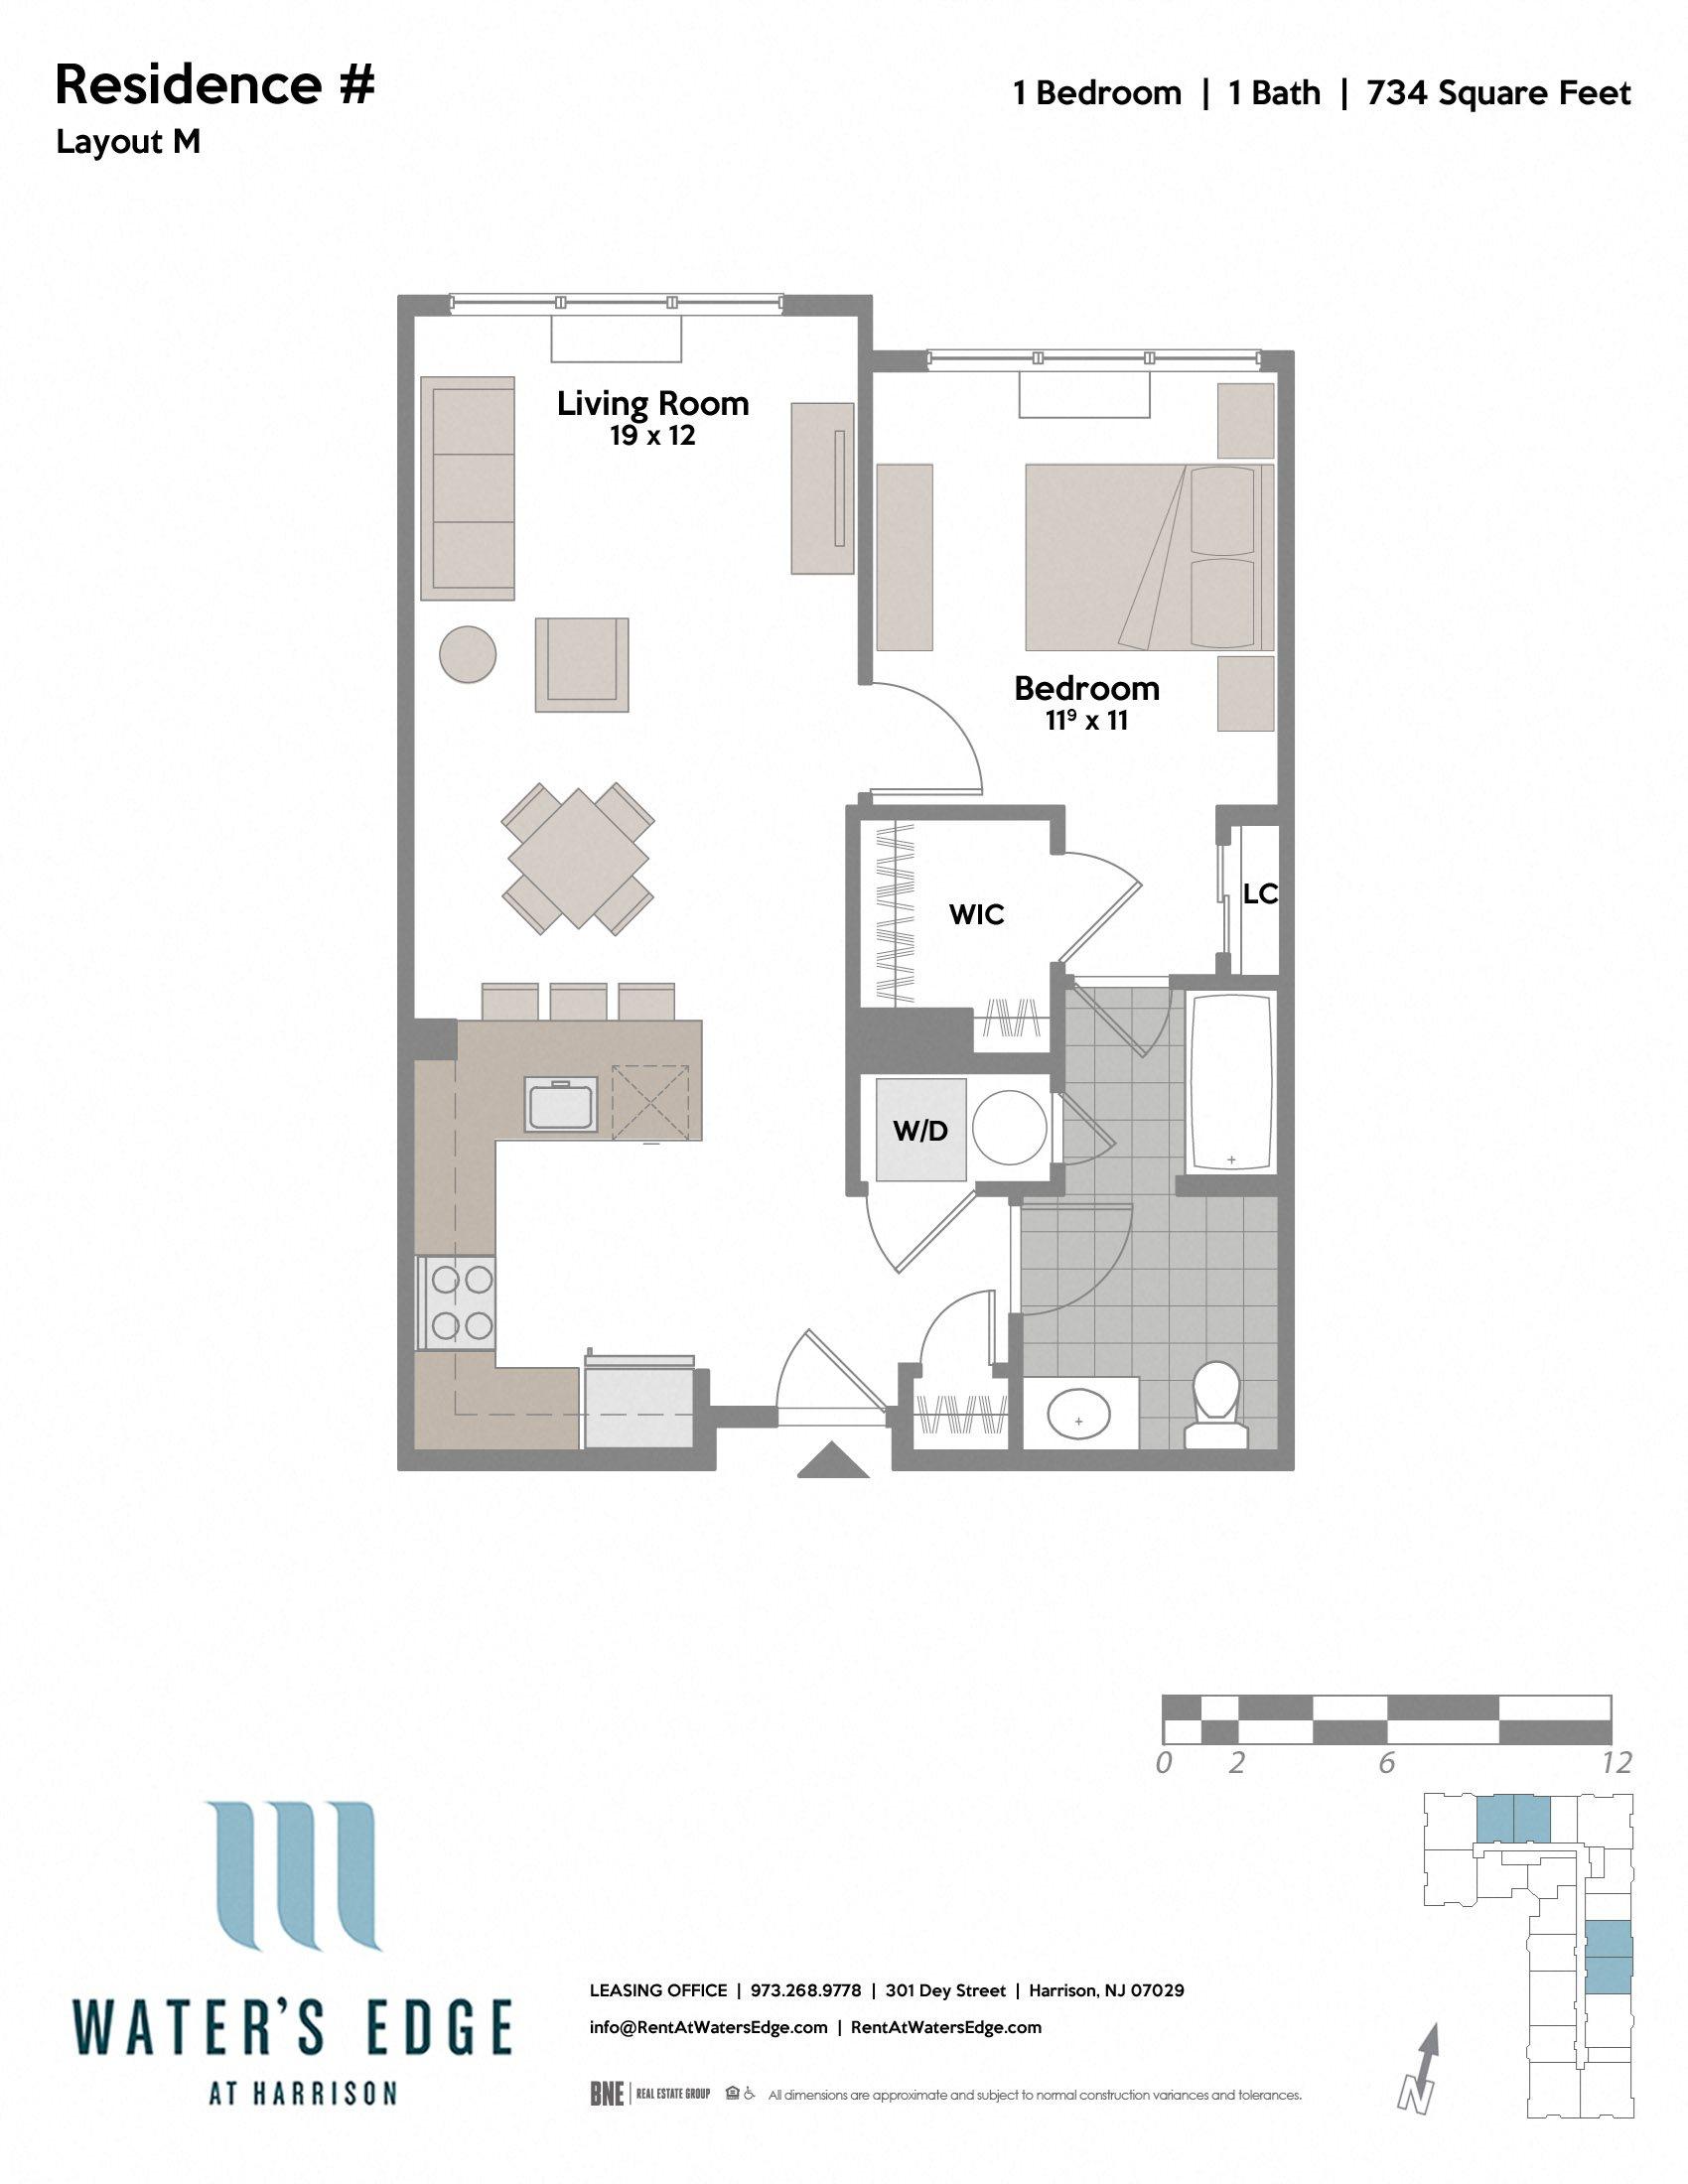 Layout M Floor Plan 2